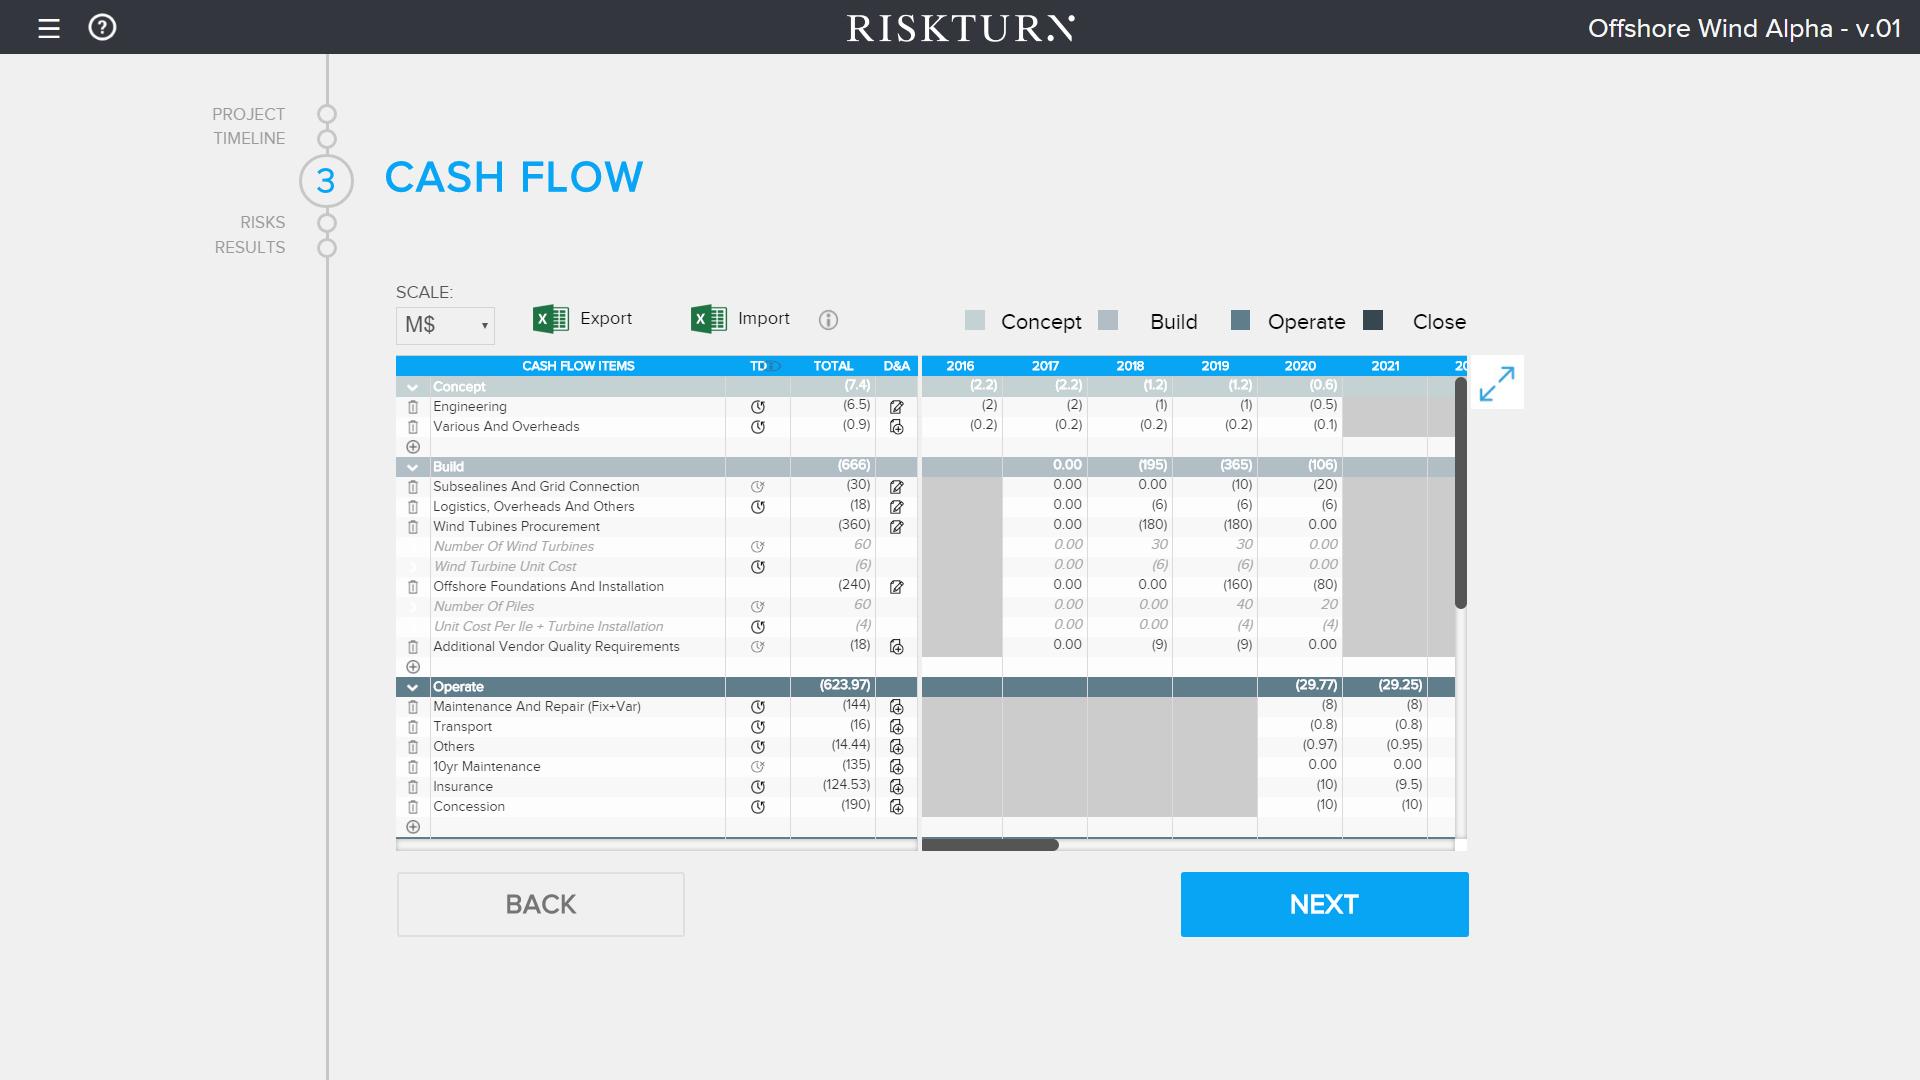 RISKTURN Software - Input cash flow